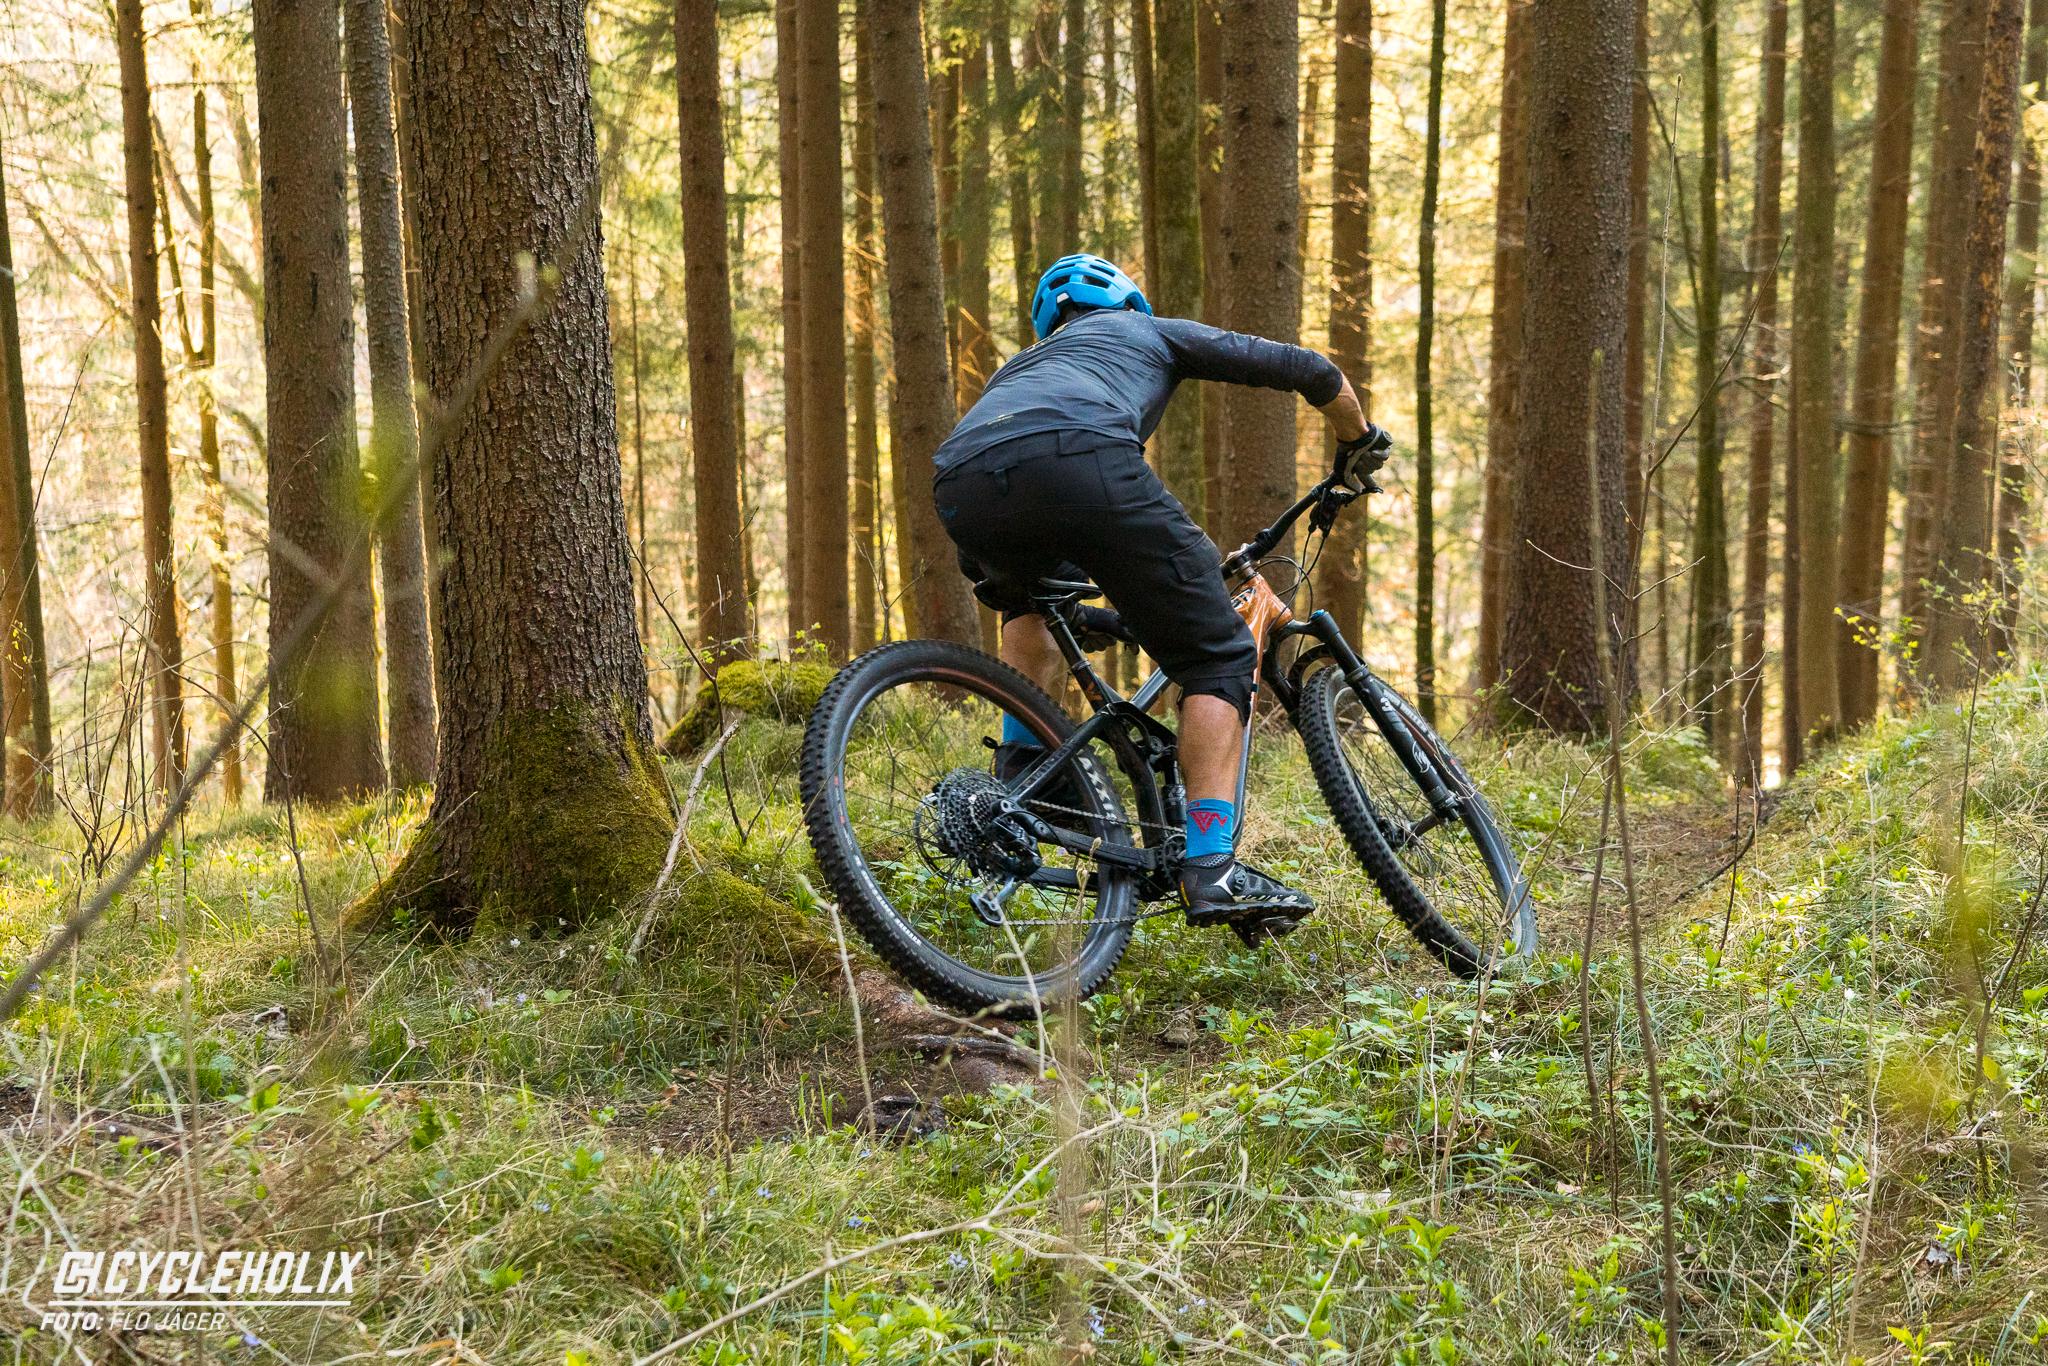 FJP4650 Cycleholix